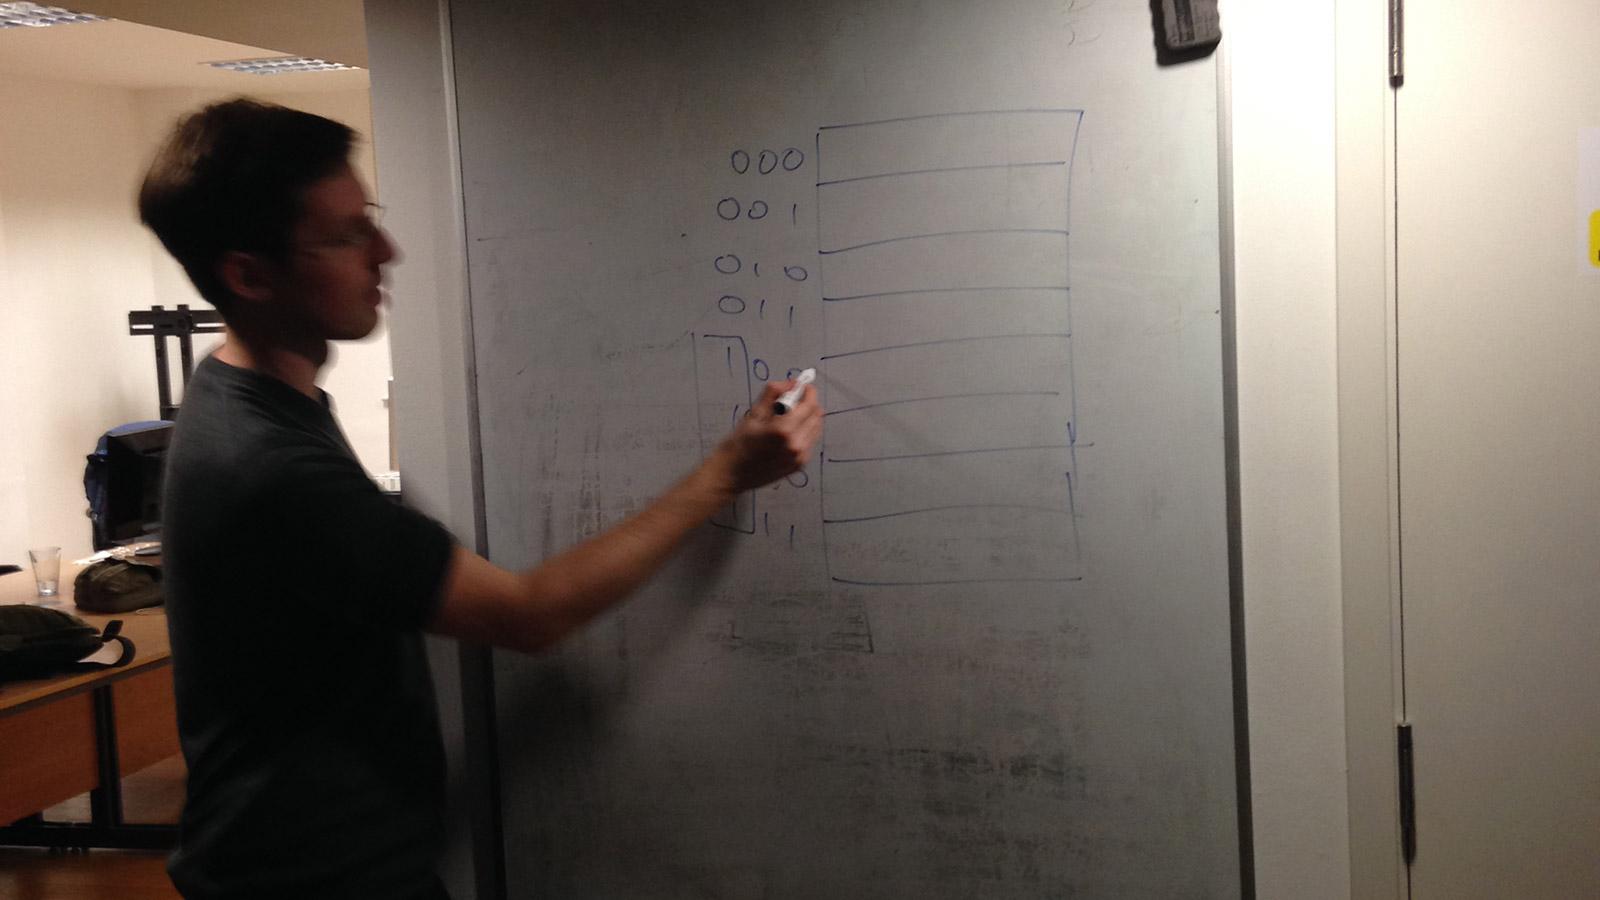 Leo draws addressing